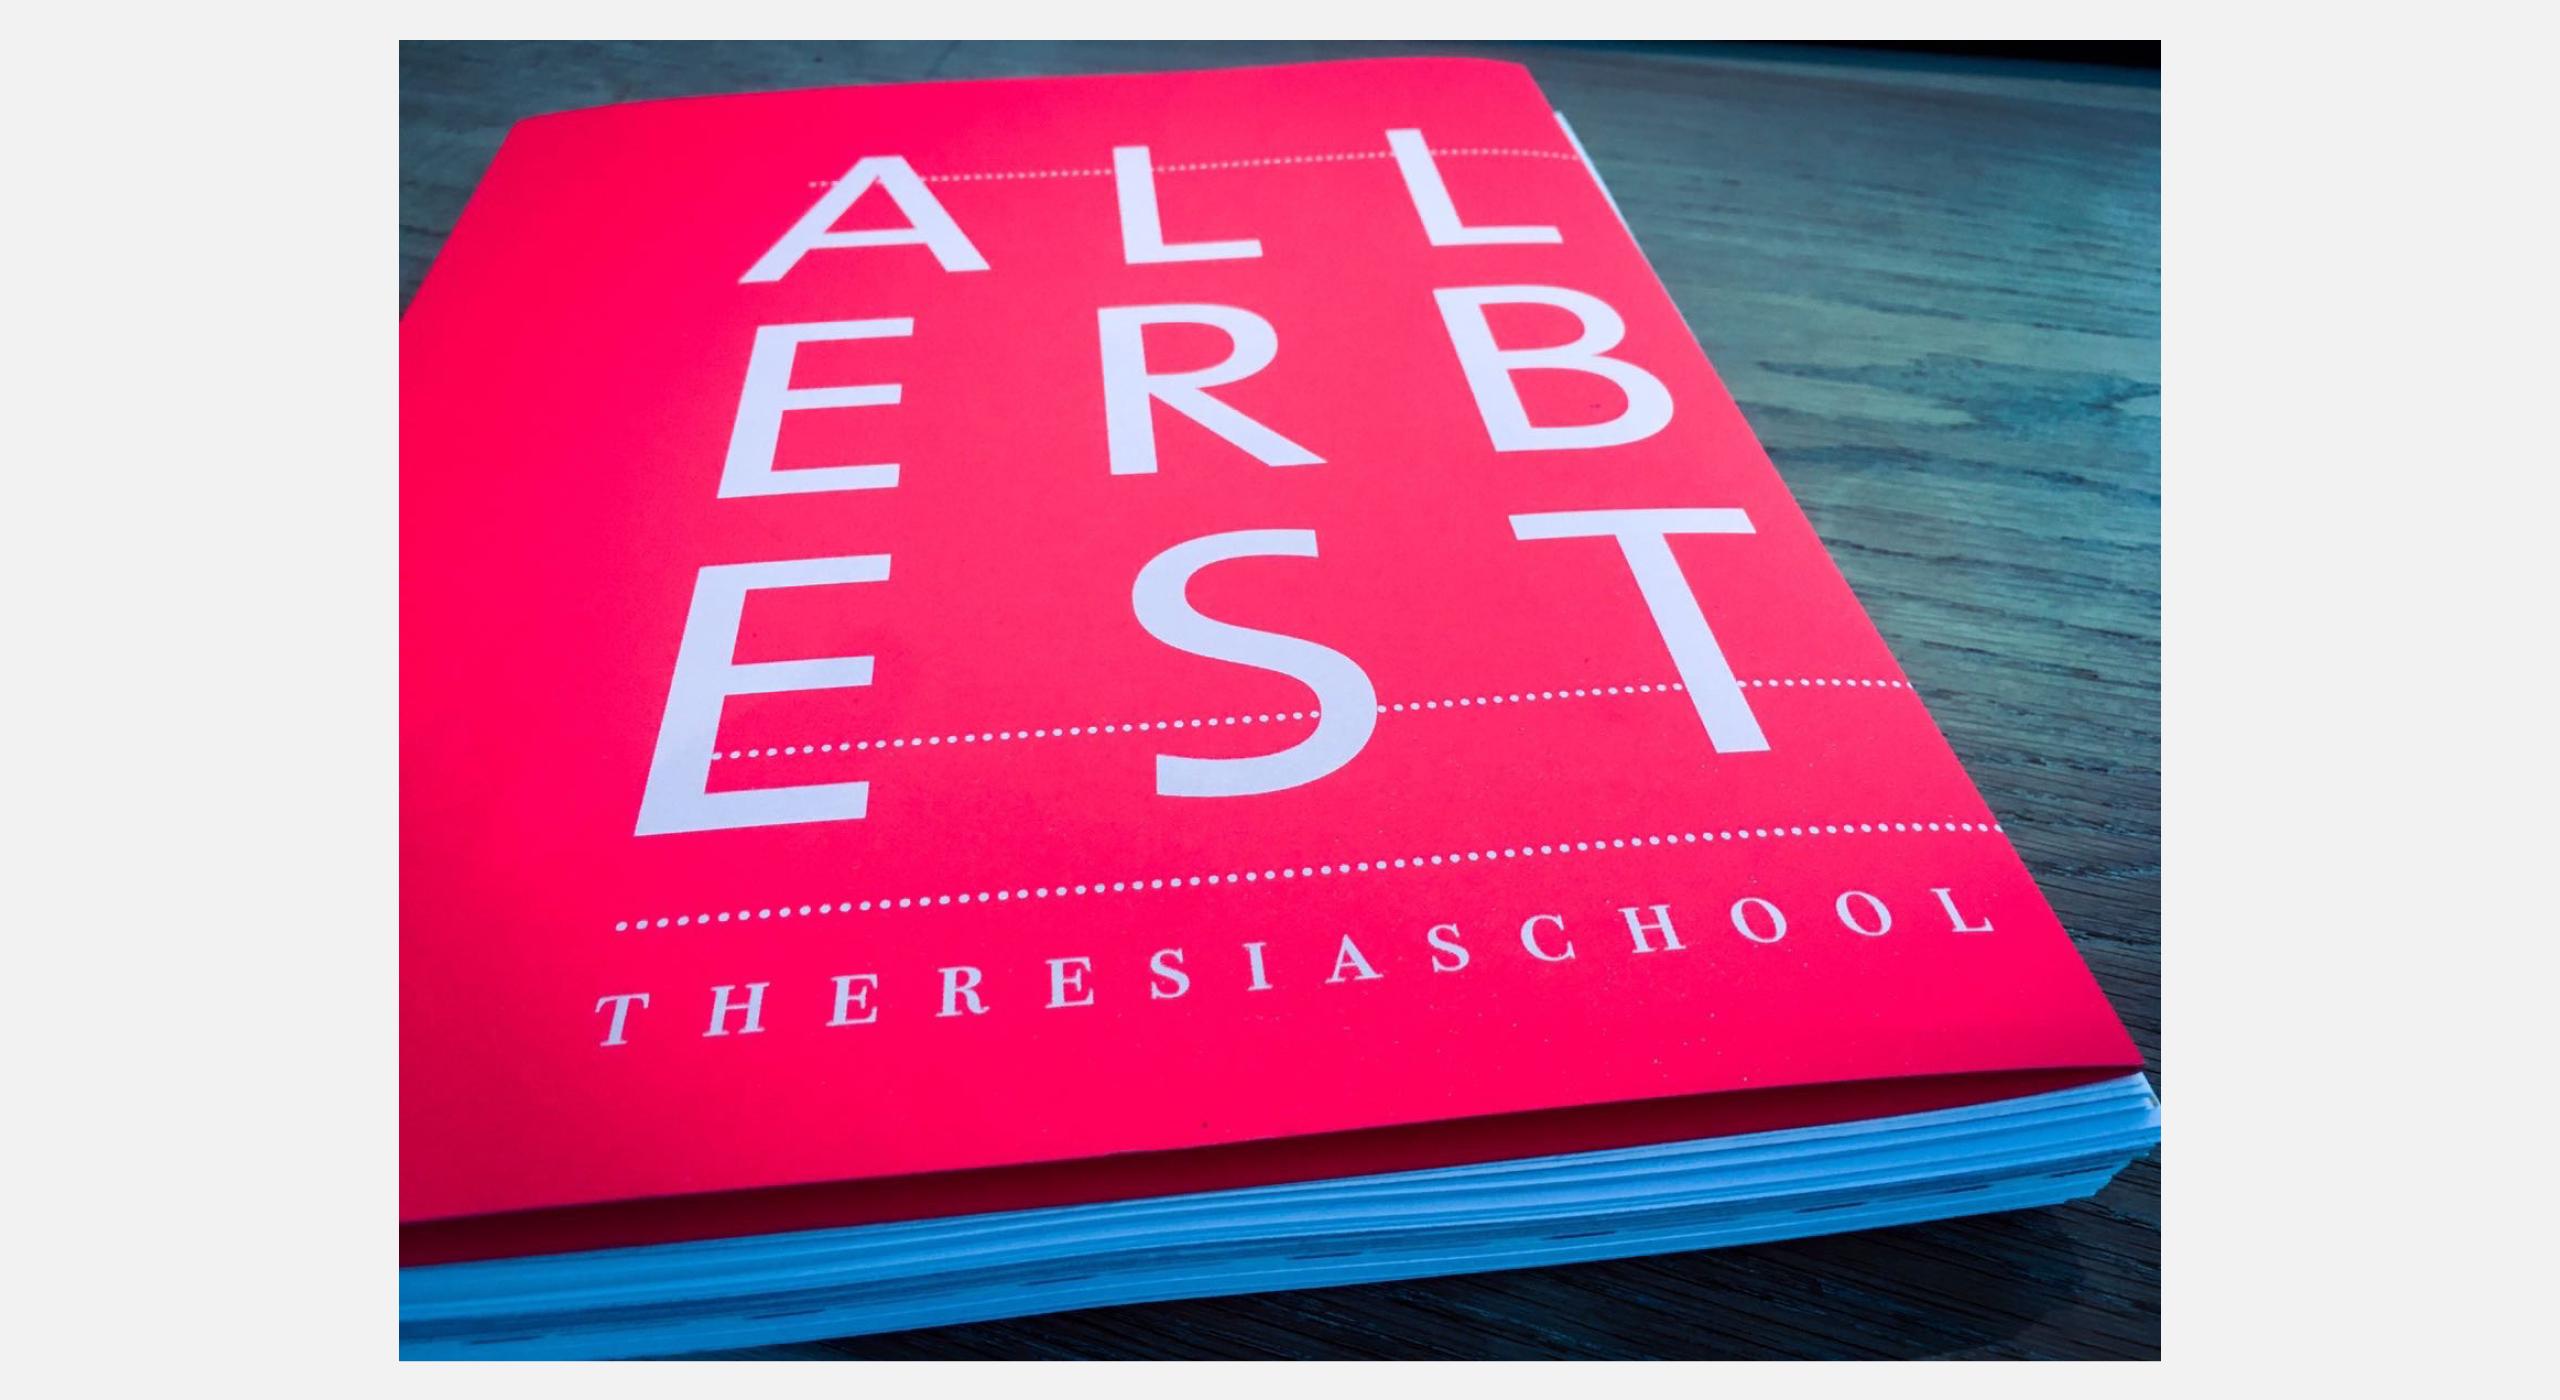 Theresia_Afscheidsboek groep8_12